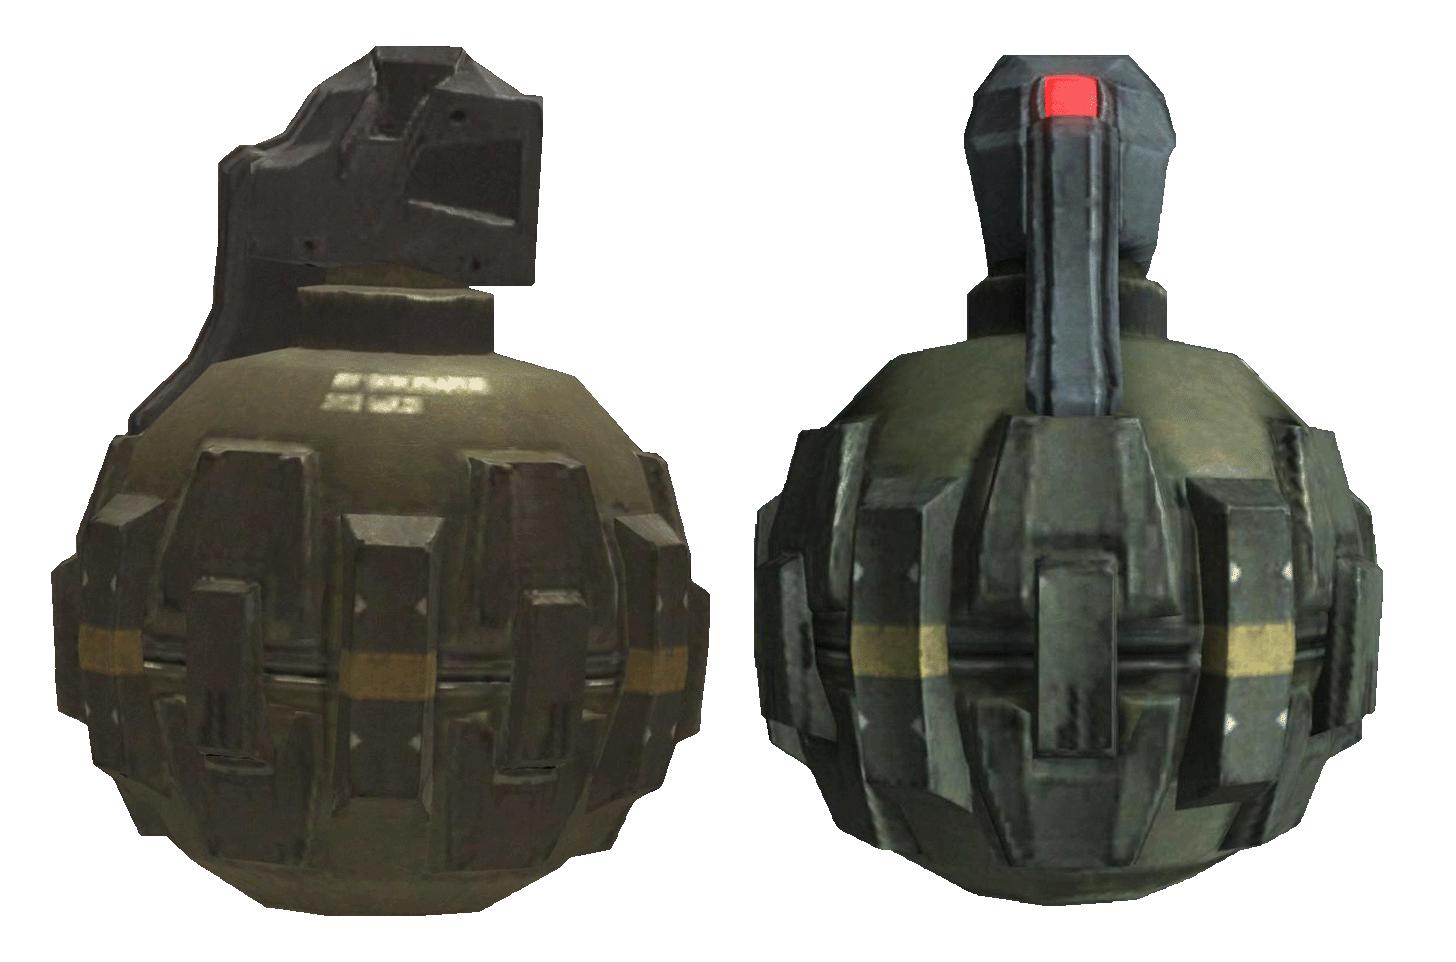 Hreach   M9 Grenade.png - Grenade, Transparent background PNG HD thumbnail